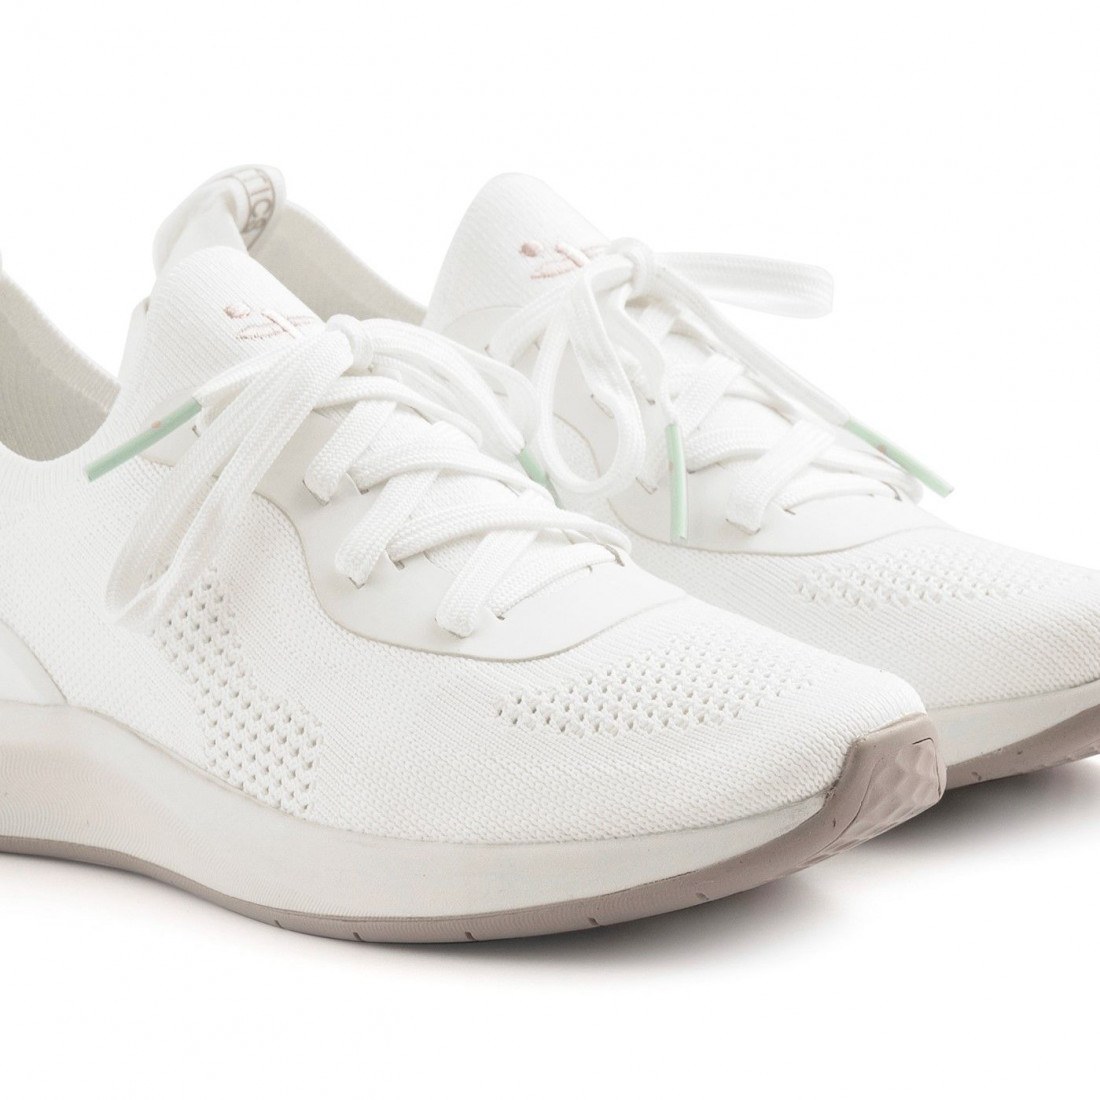 Women's Tamaris Fashletics white sneakers